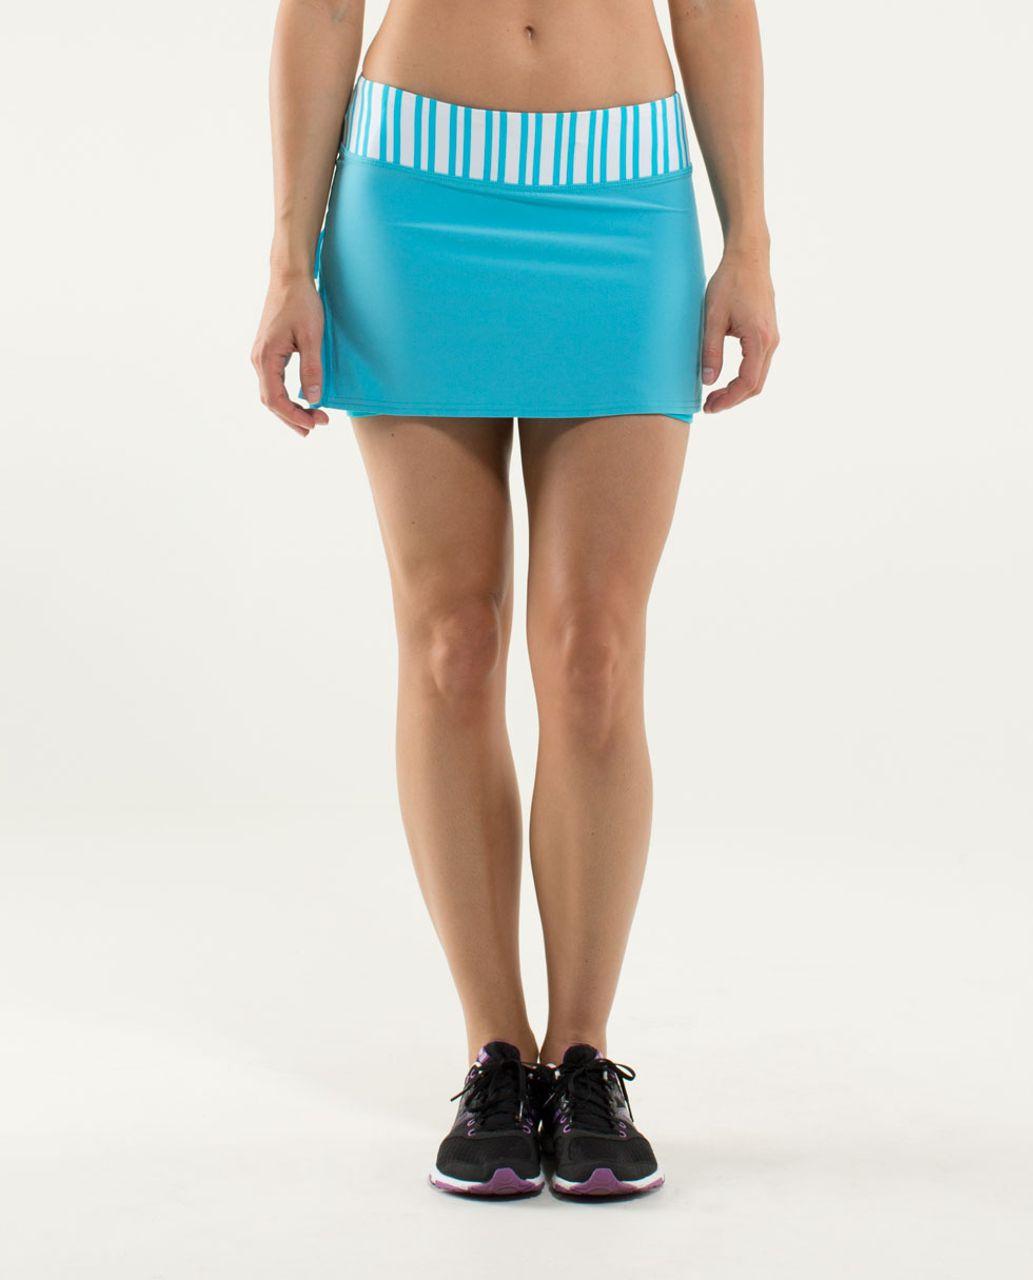 Lululemon Run:  Pace Setter Skirt (Regular) - Spry Blue / Twin Stripe Spry Blue